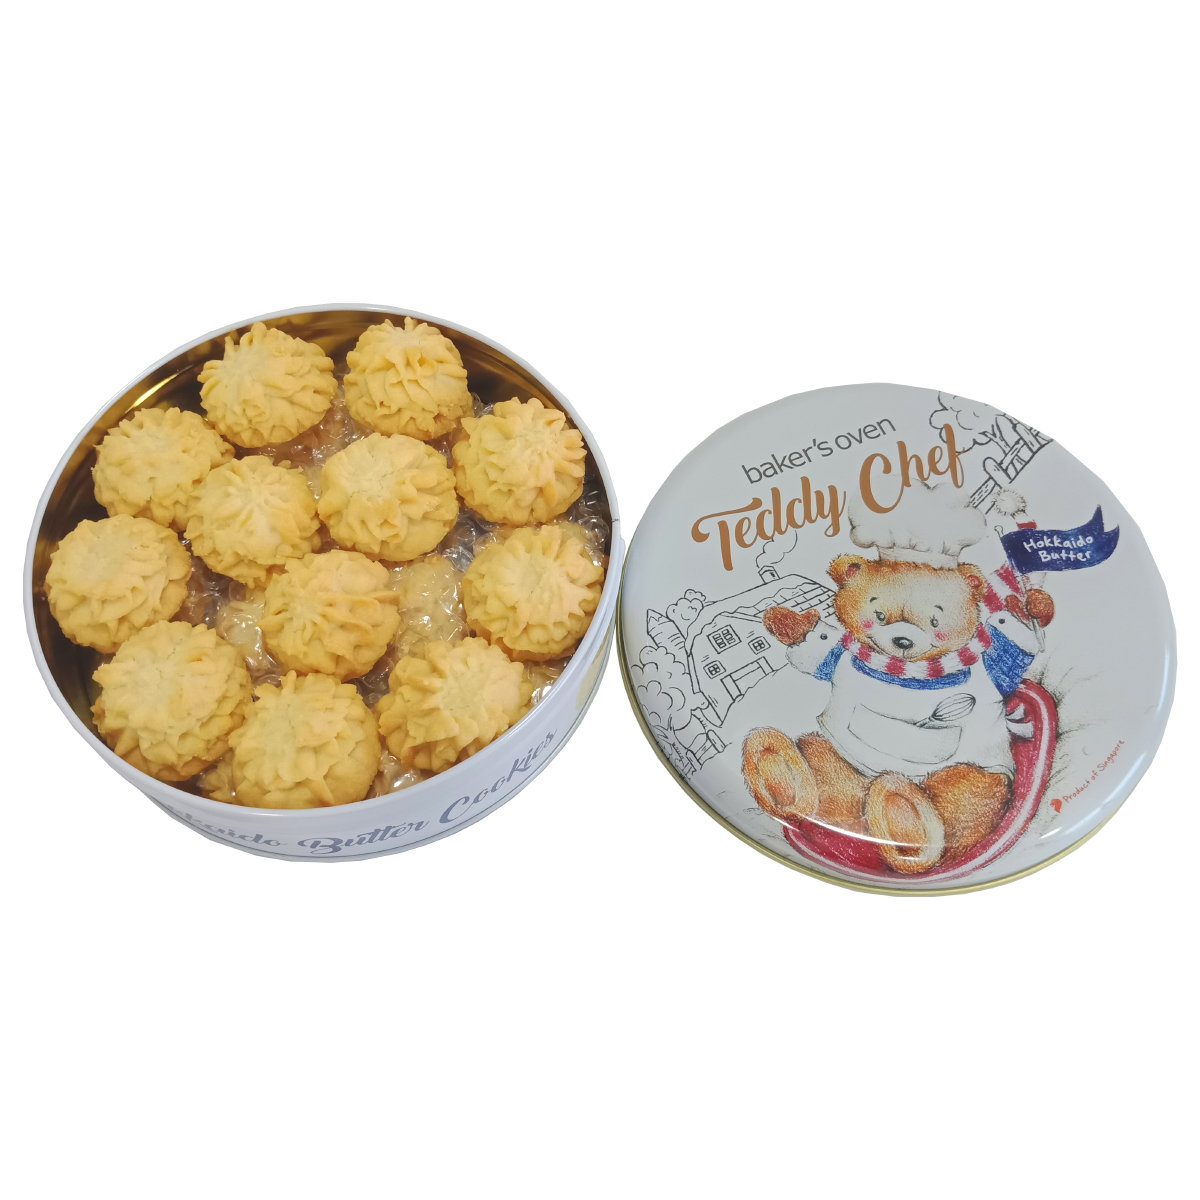 Teddy Chef - Hokkaido Butter Cookies | Baker's Oven